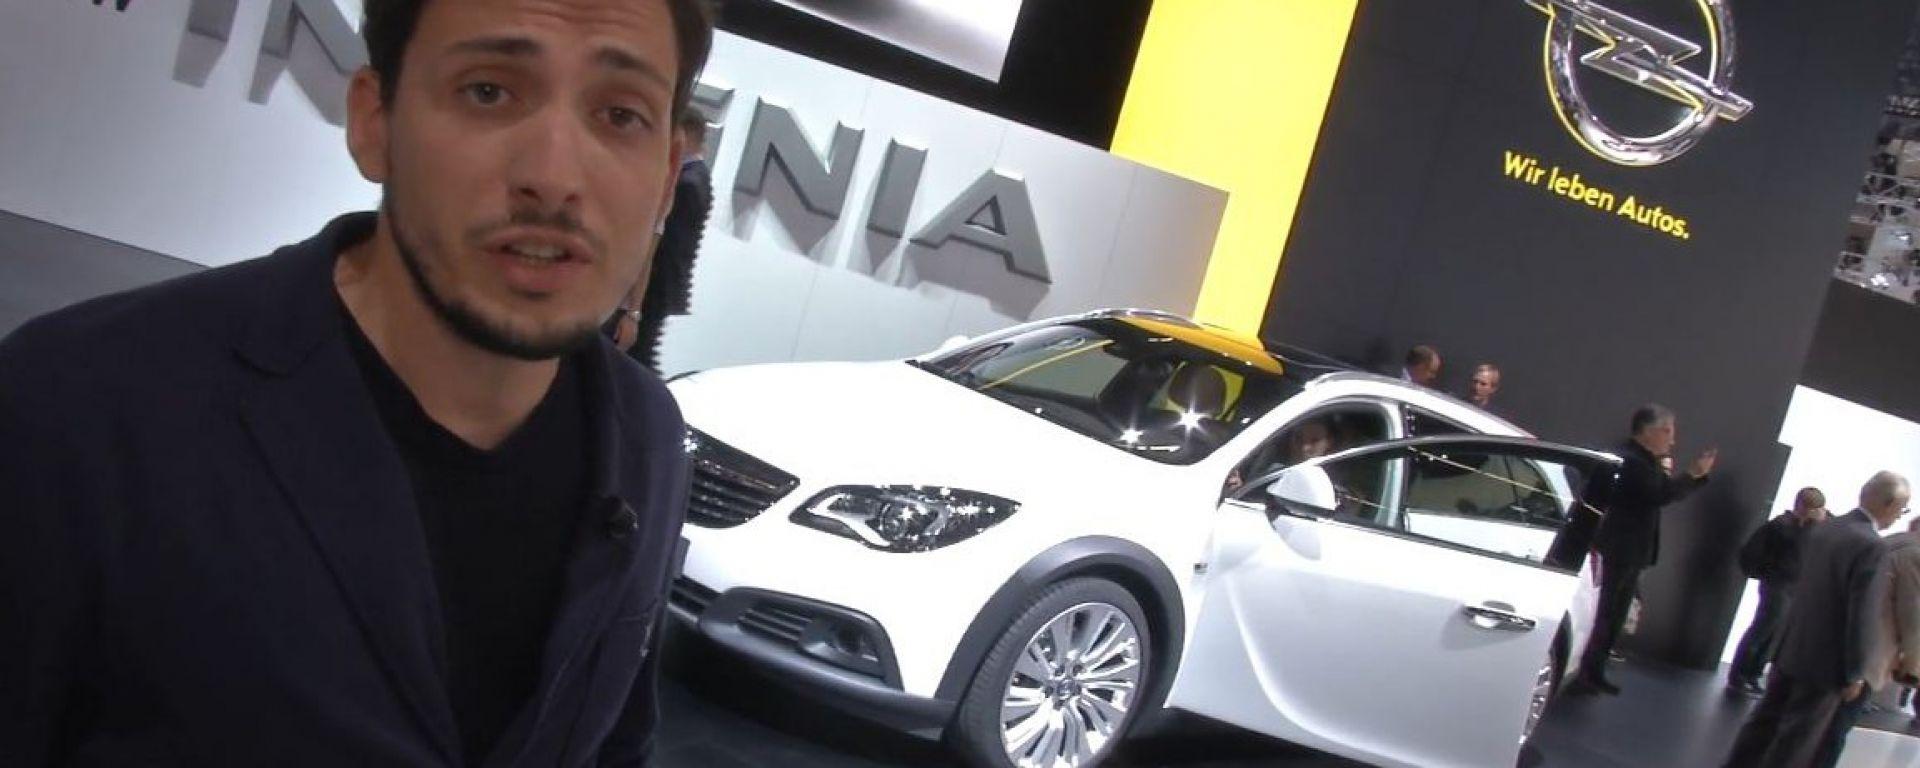 Francoforte 2013, lo stand Opel